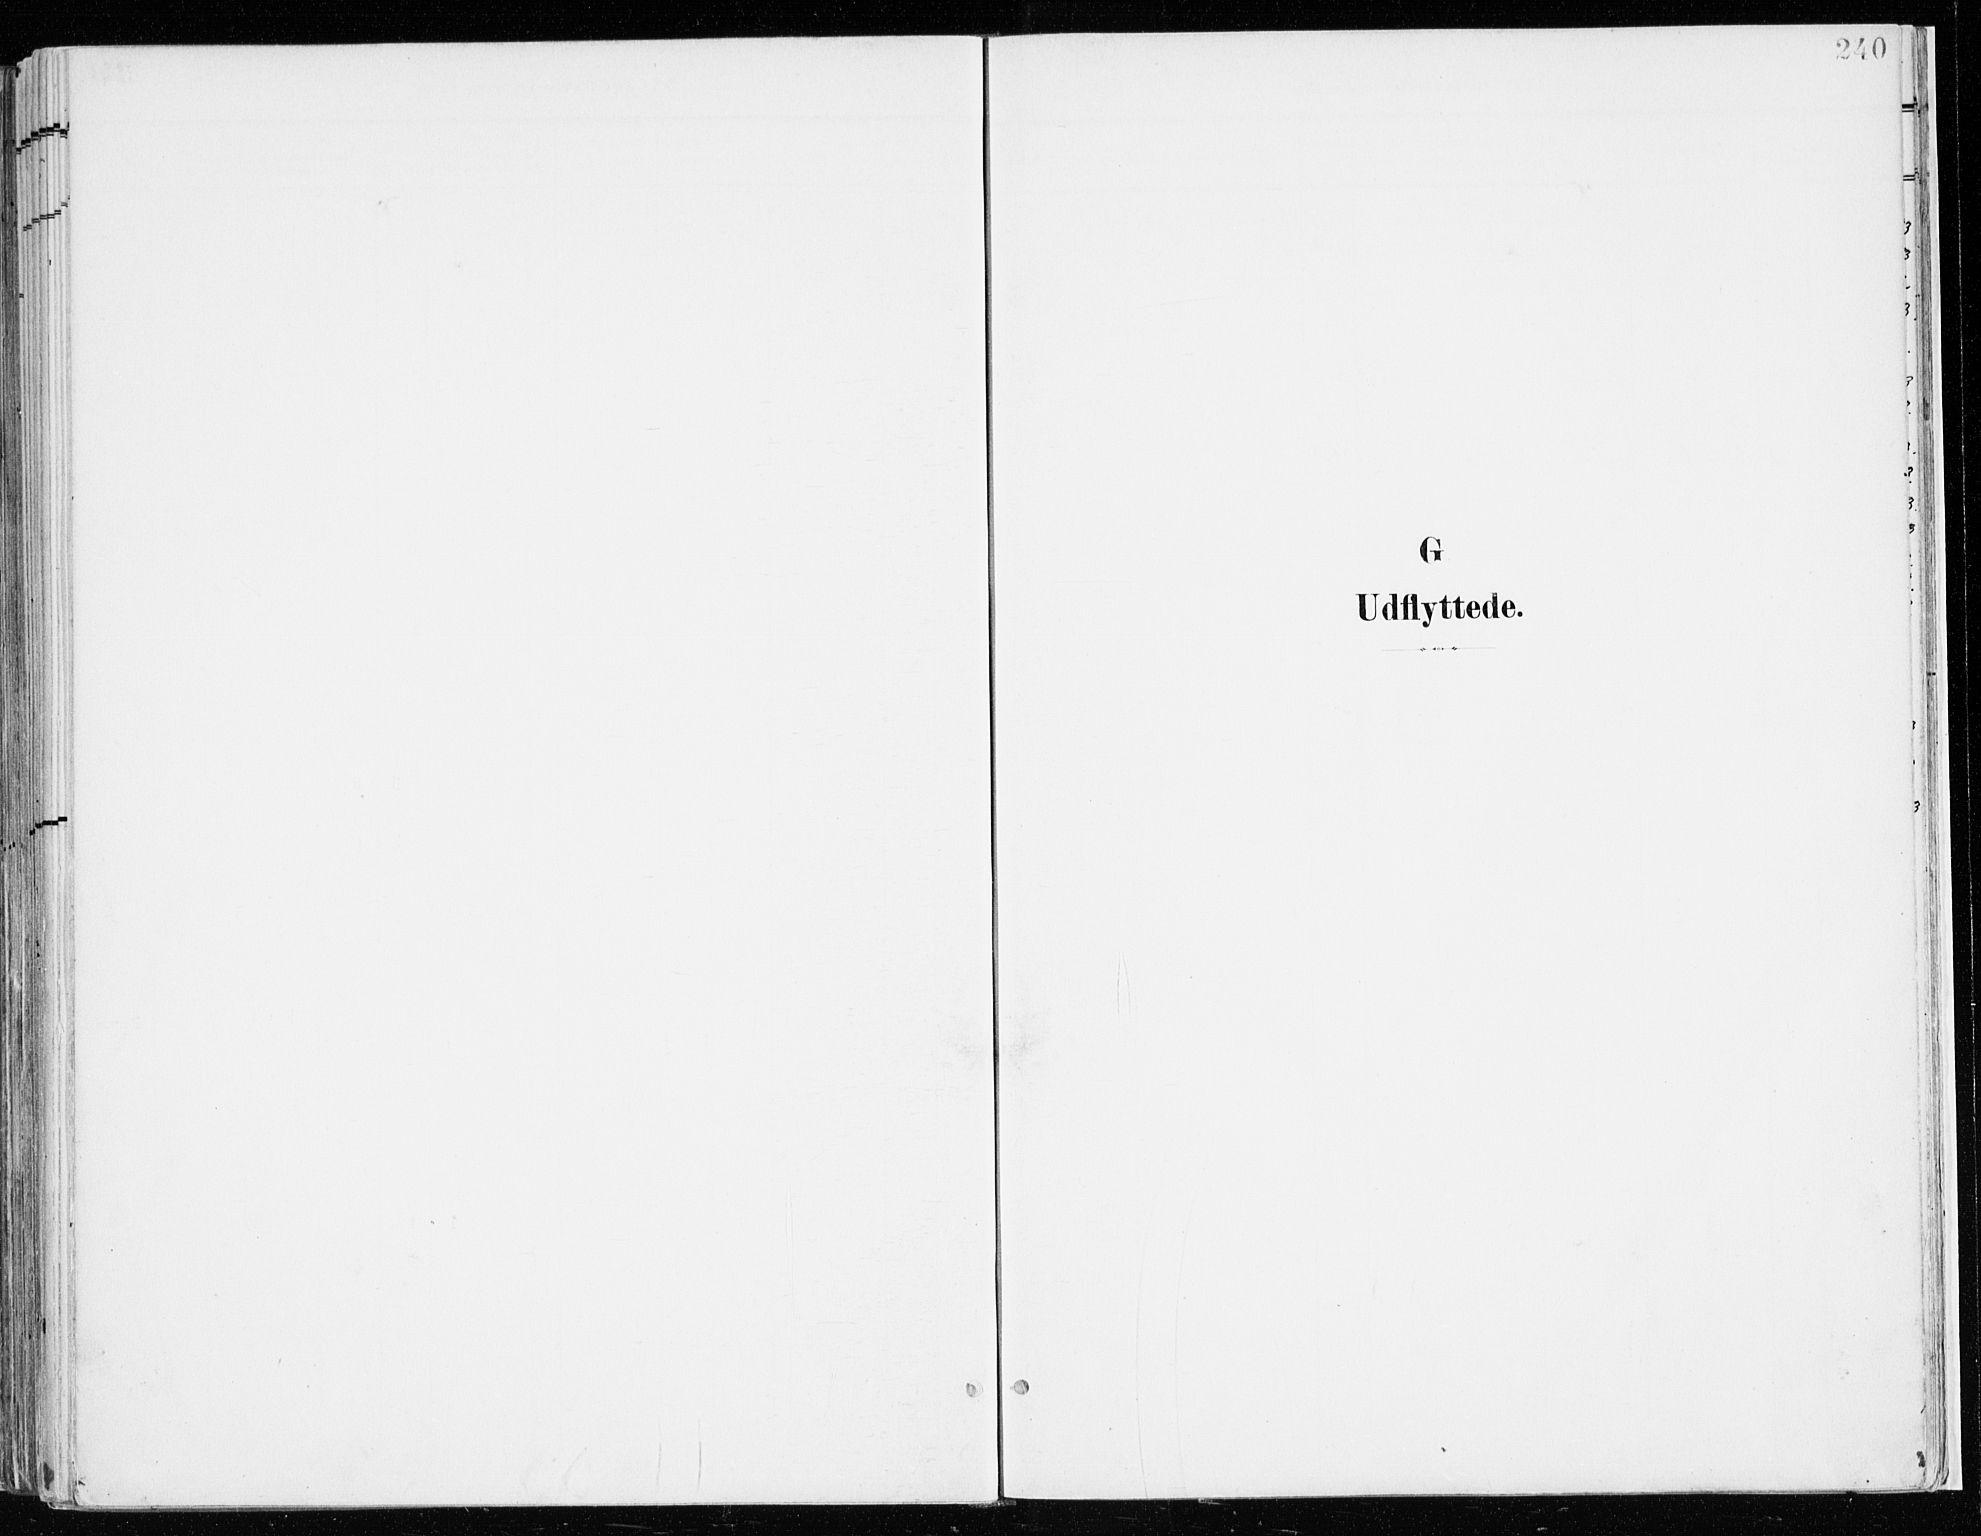 SAH, Nord-Odal prestekontor, Ministerialbok nr. 9, 1902-1926, s. 240